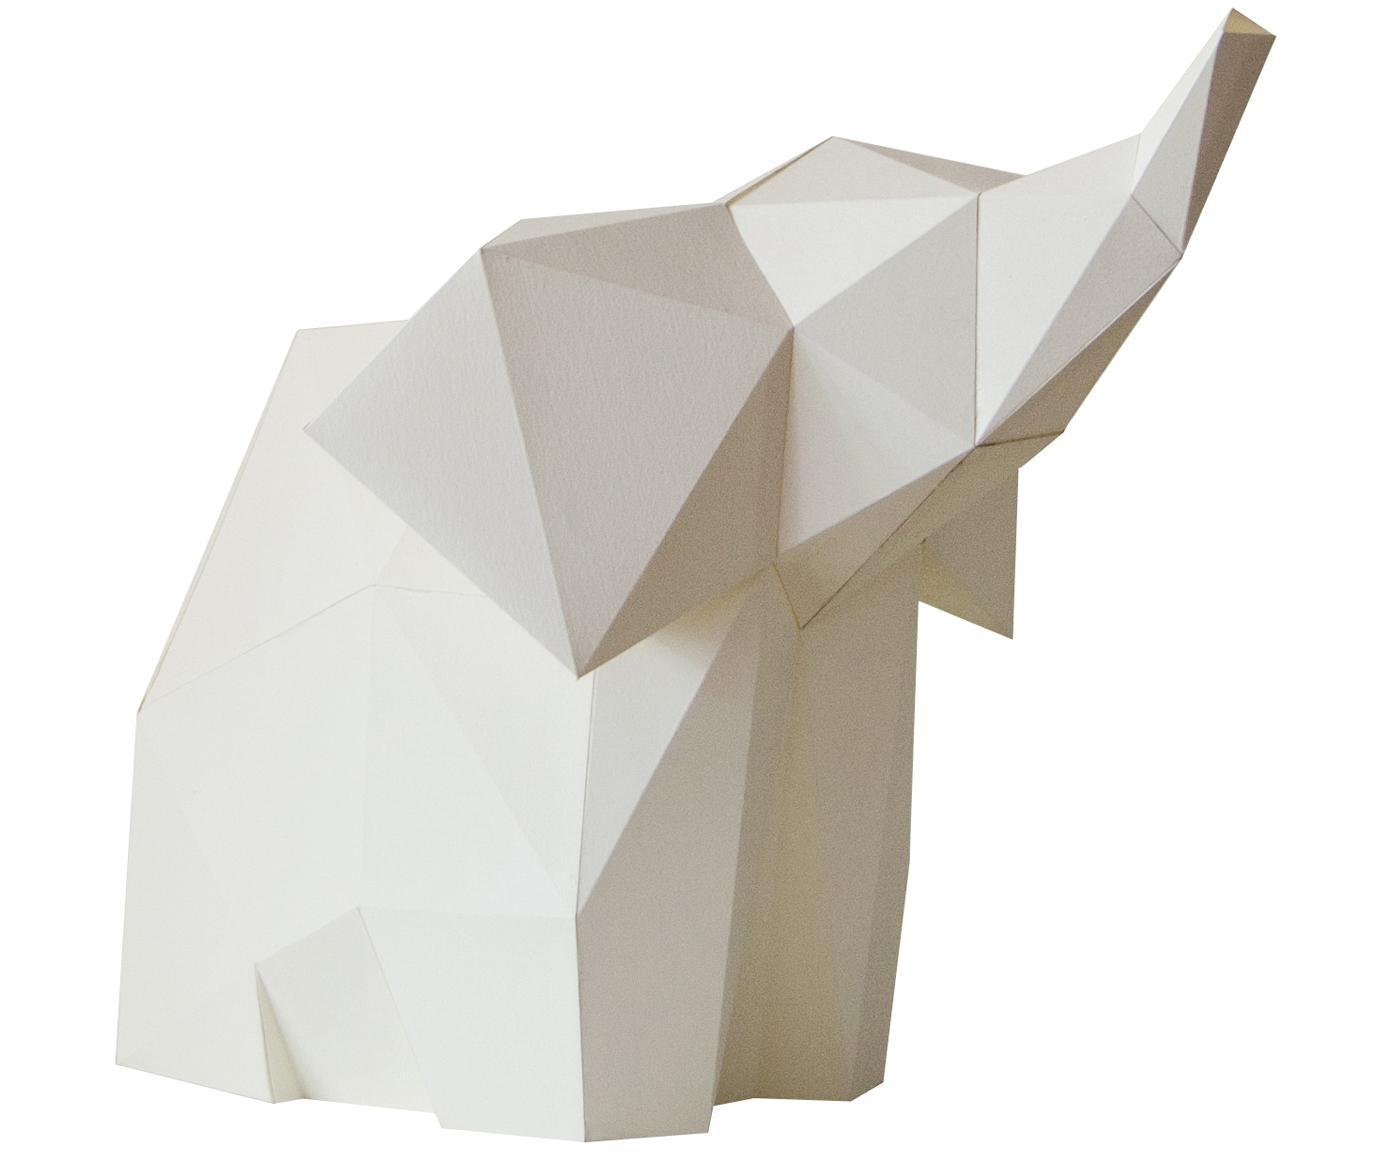 Lámpara de mesa LED Baby Elephant, kit de montaje, Pantalla: papel, 160 g/m², Blanco, An 23 x Al 24 cm